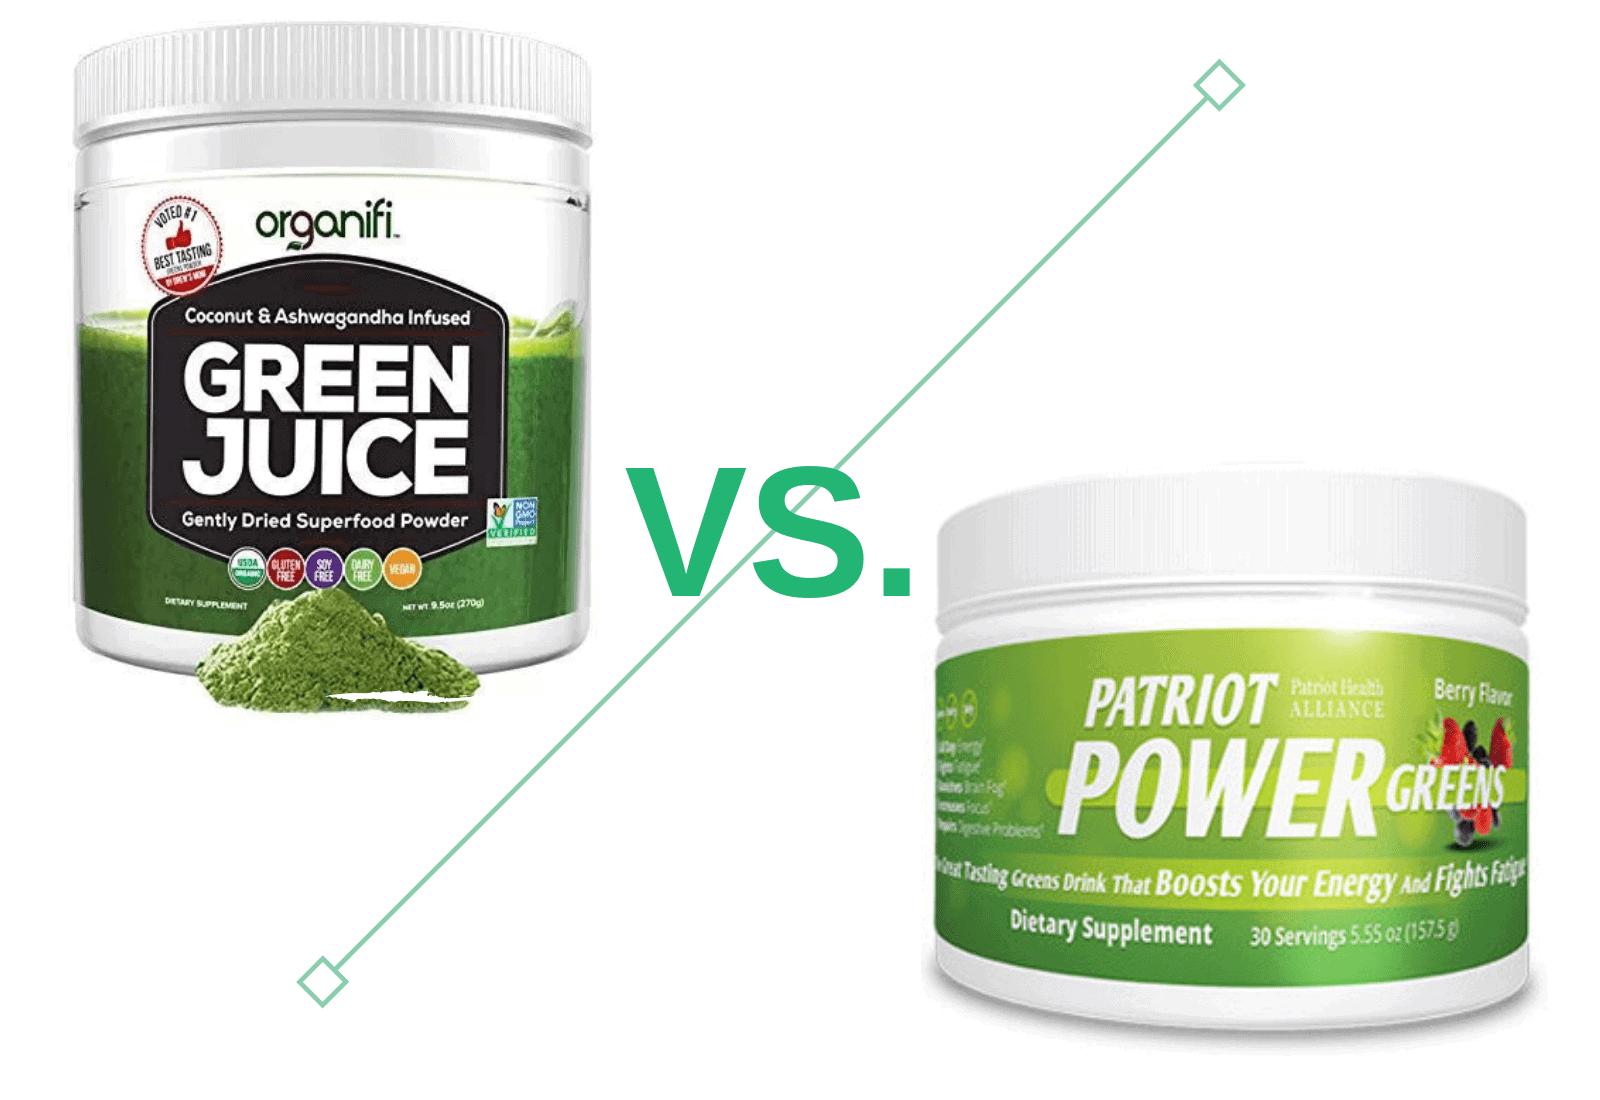 Organifi Green Juice vs Patriot Greens - Which Green Juice is Best?